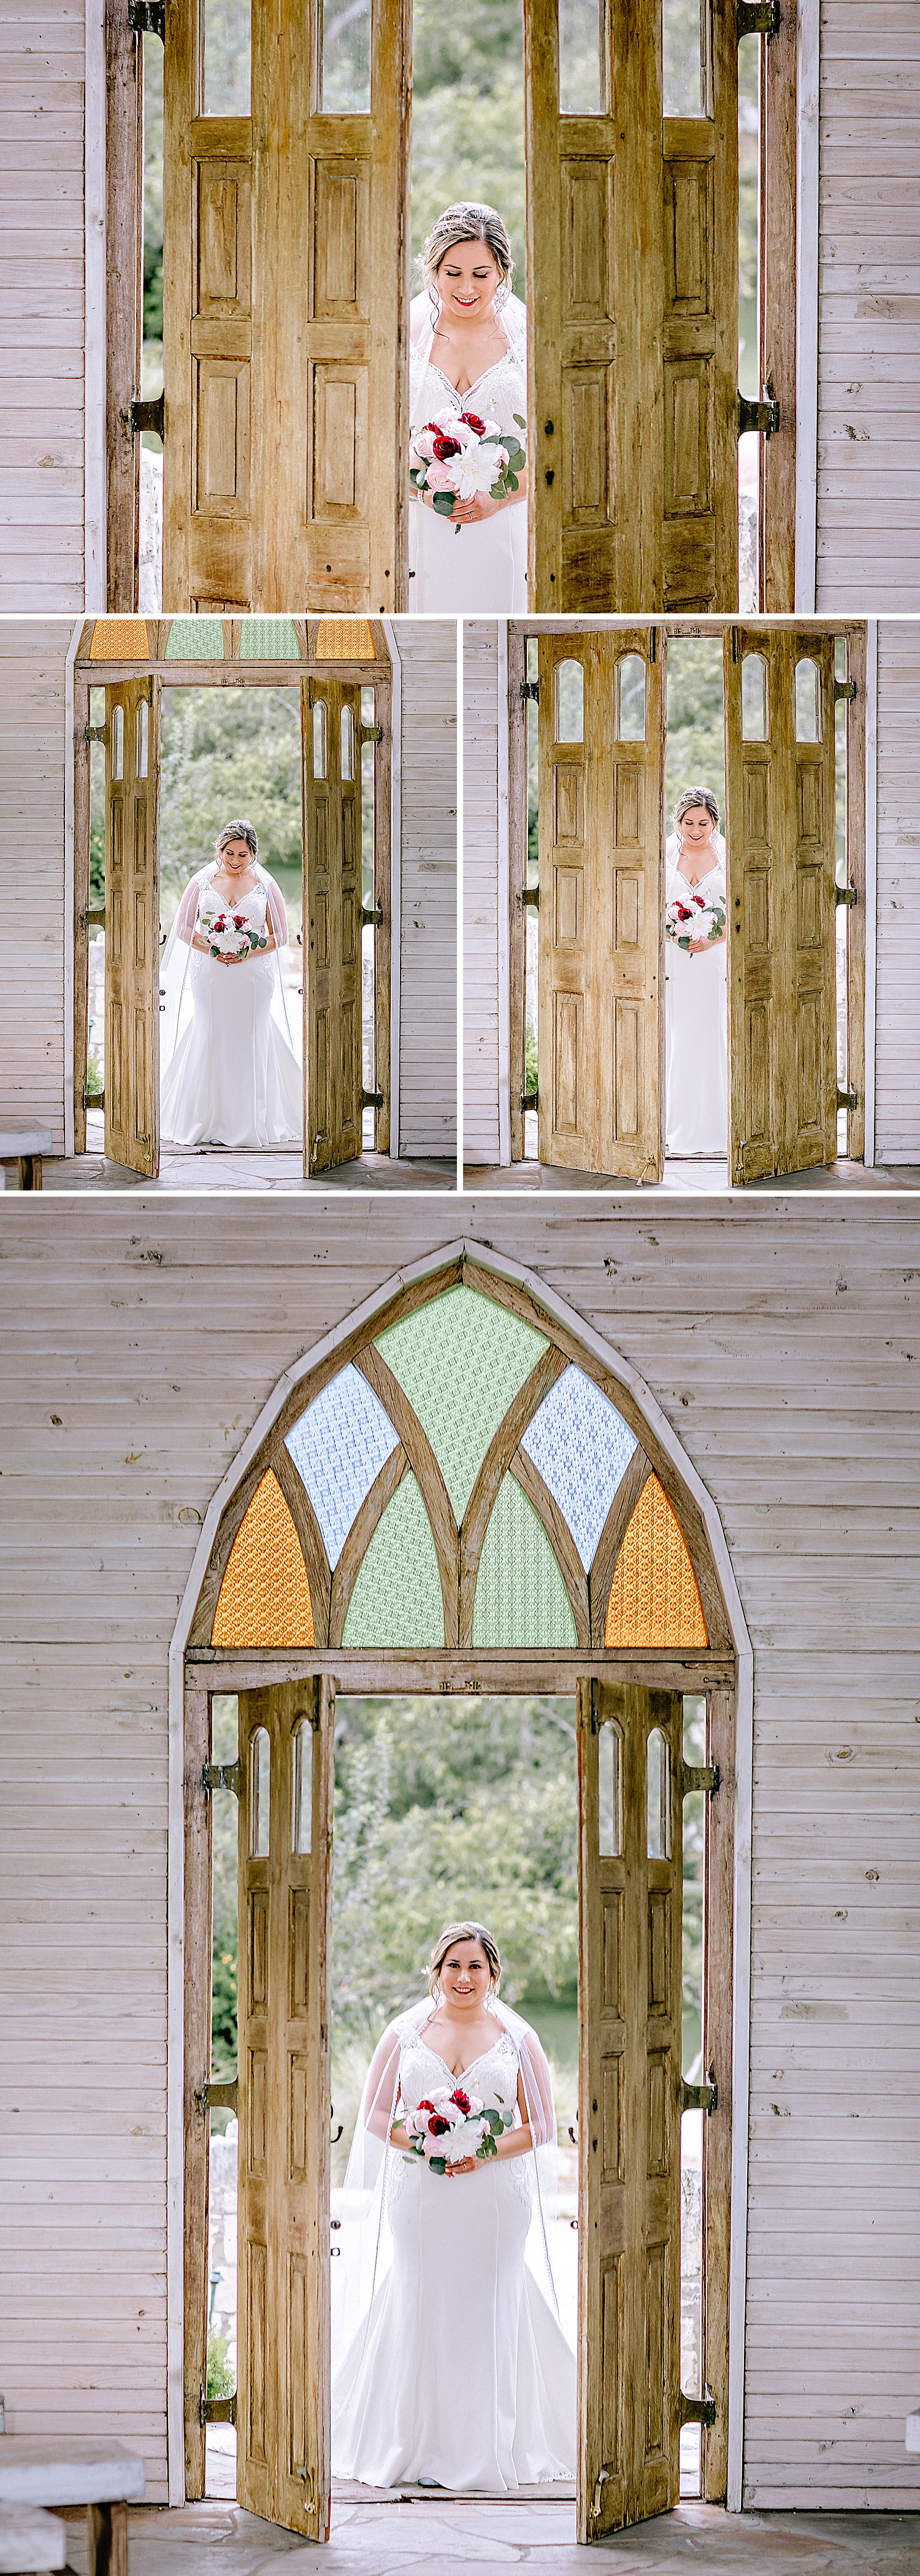 Carly-Barton-Photography-Gruene-Estate-Wedding-Photographer-New-Braunfels-Texas-Bridal-Session_0020.jpg